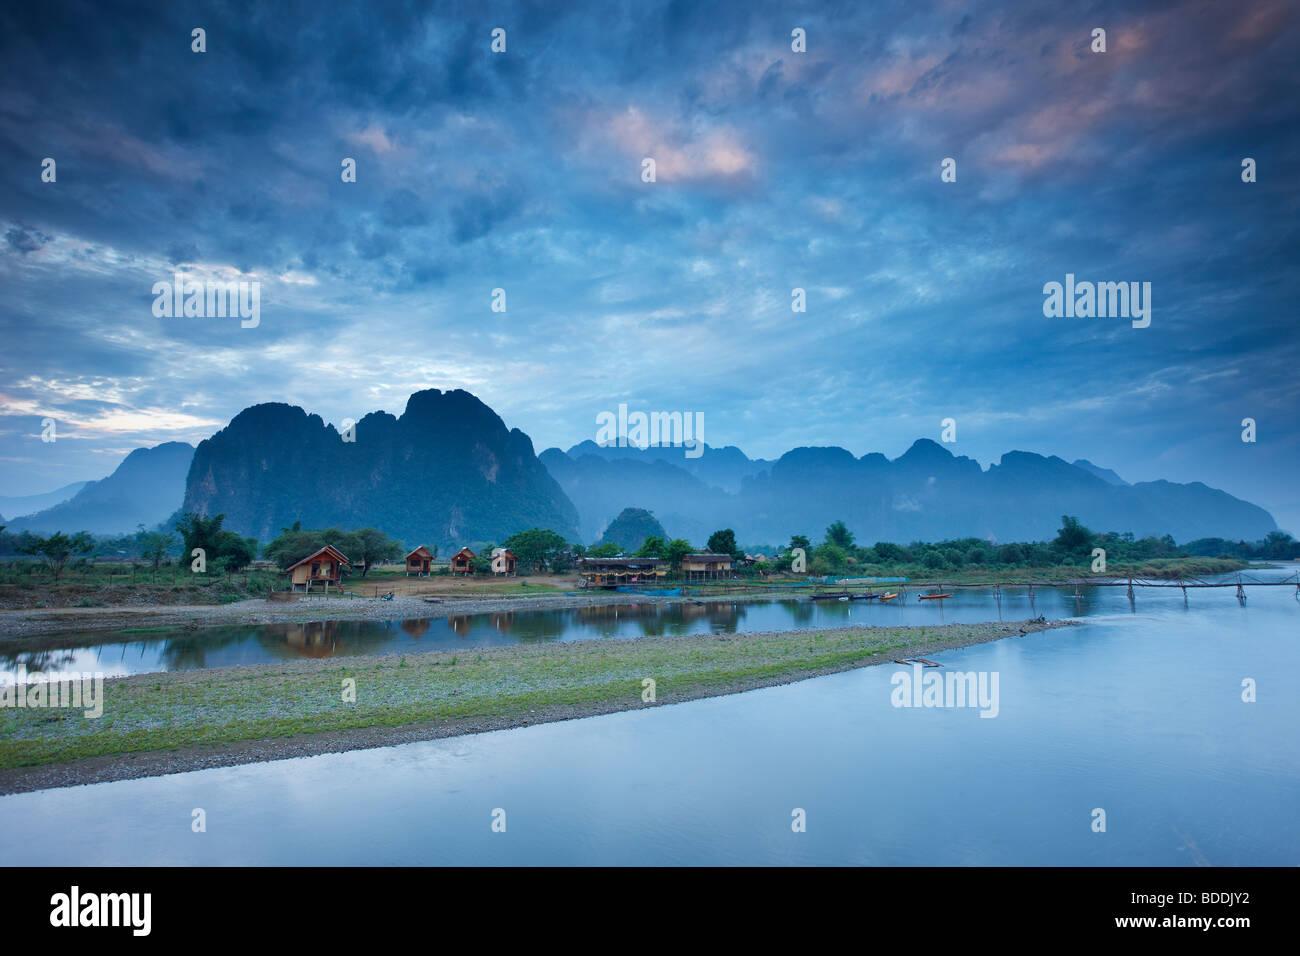 Sonnenaufgang über den Bergen und Nam Song River in Vang Vieng, Laos Stockbild